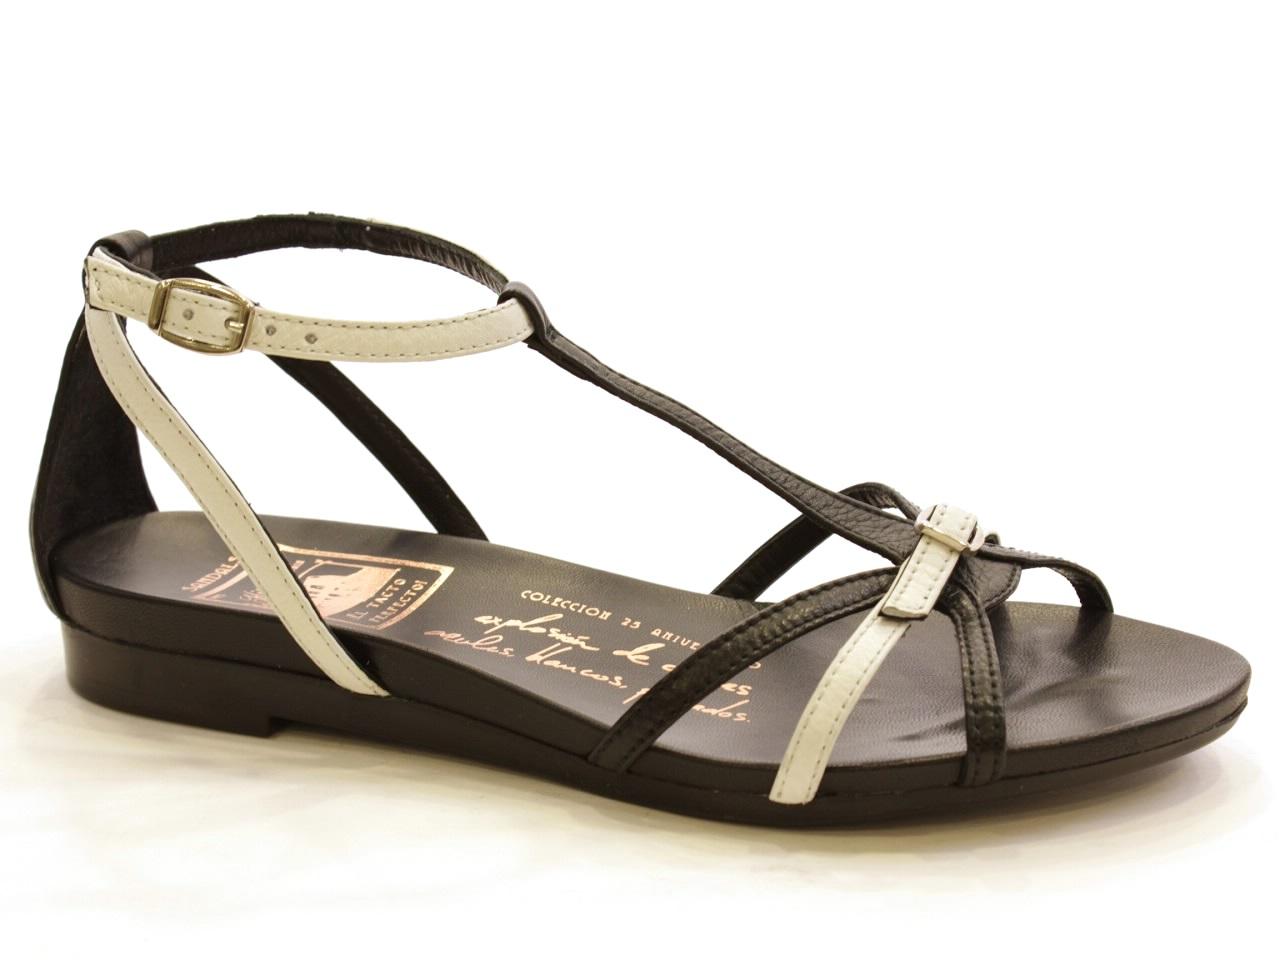 Flat Sandals Hispanitas - 165 HV49696